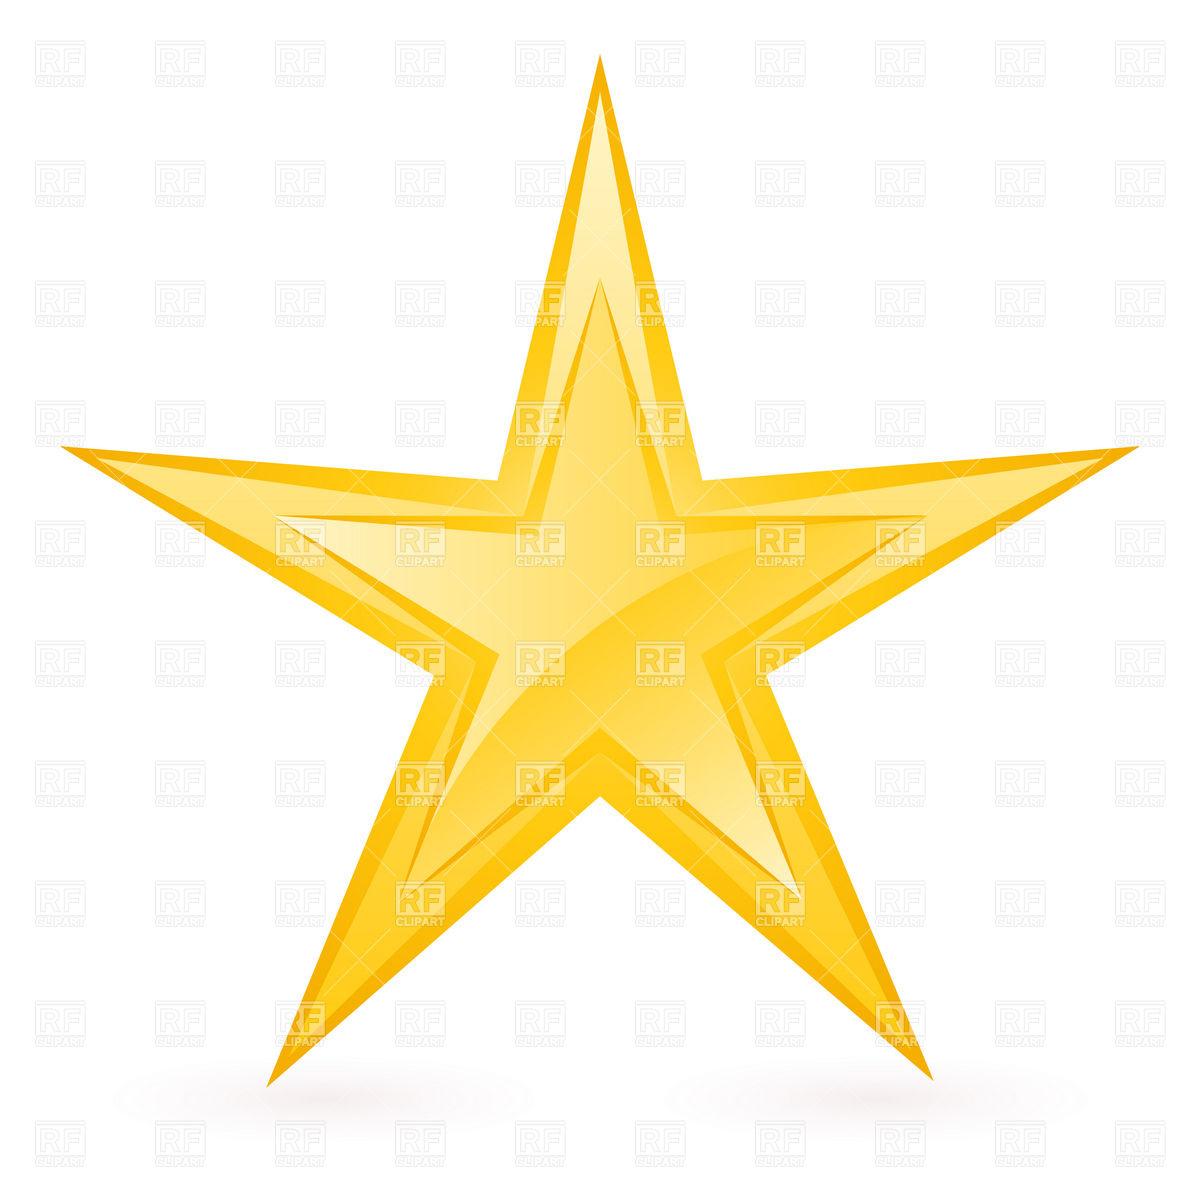 1200x1200 Shiny Thin Golden Star Vector Image Vector Artwork Of Signs